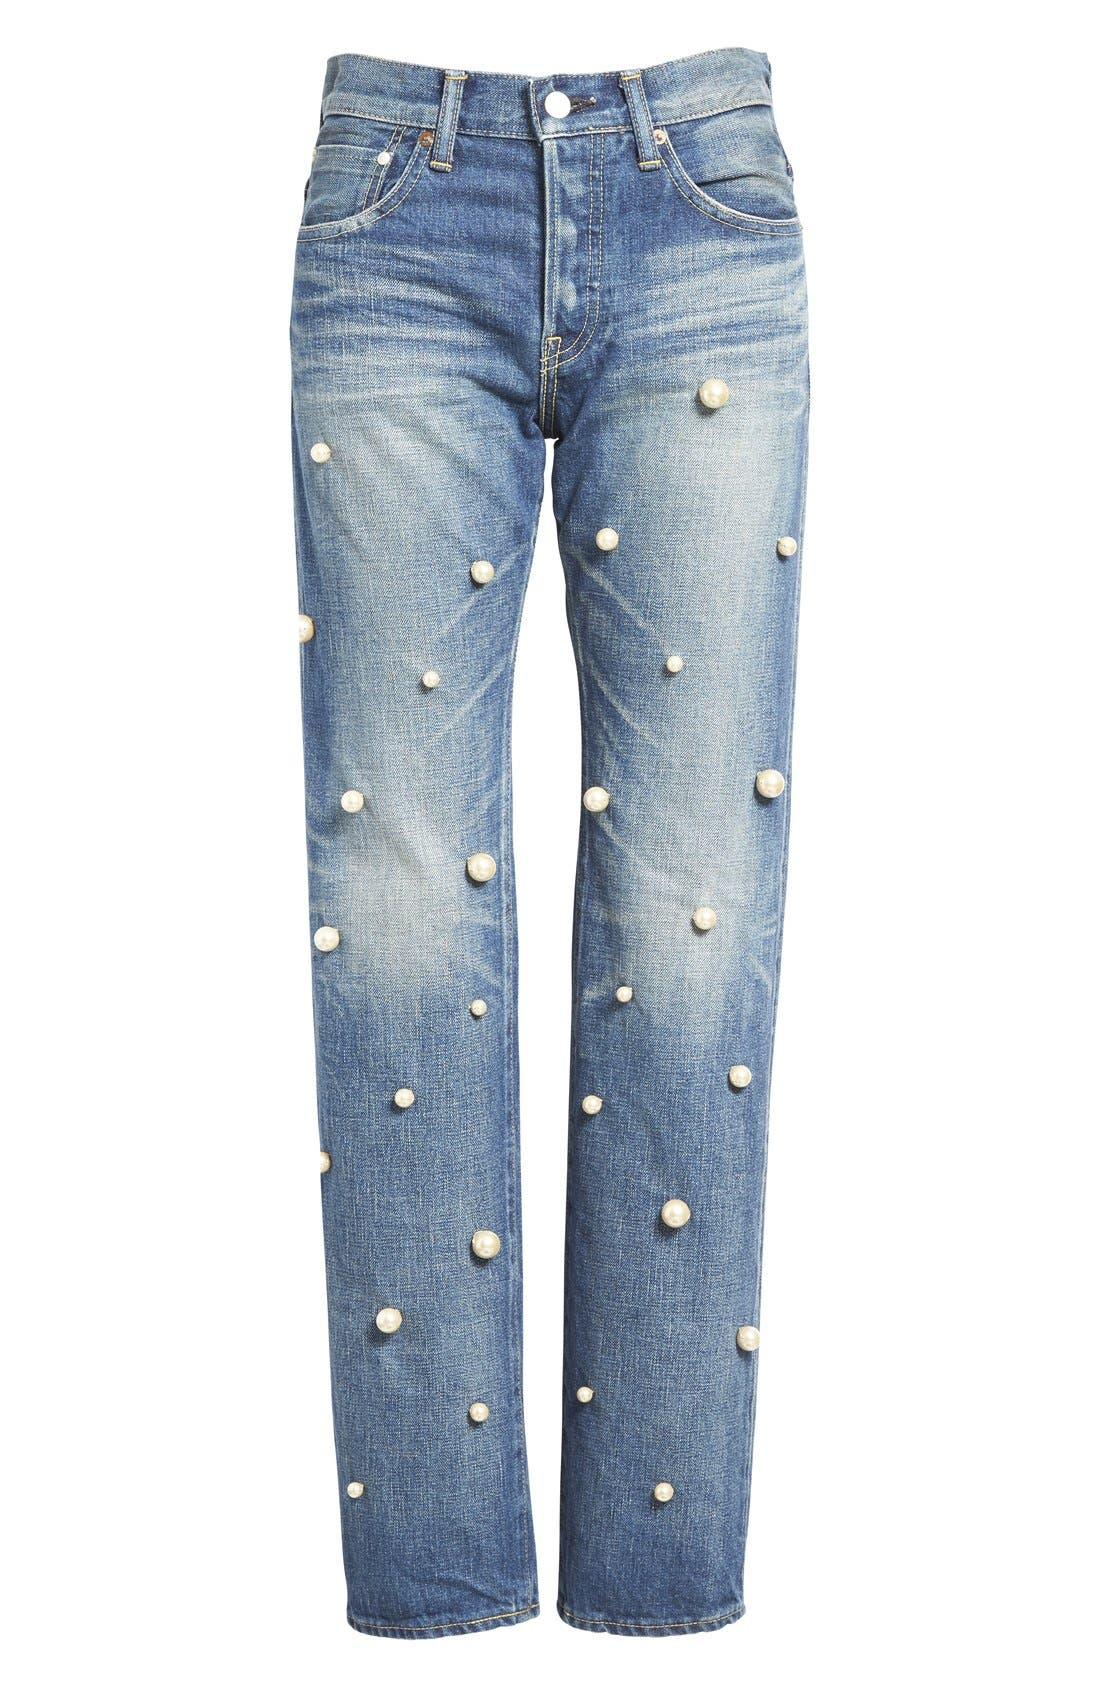 Imitation Pearl Embellished Jeans,                             Alternate thumbnail 4, color,                             101